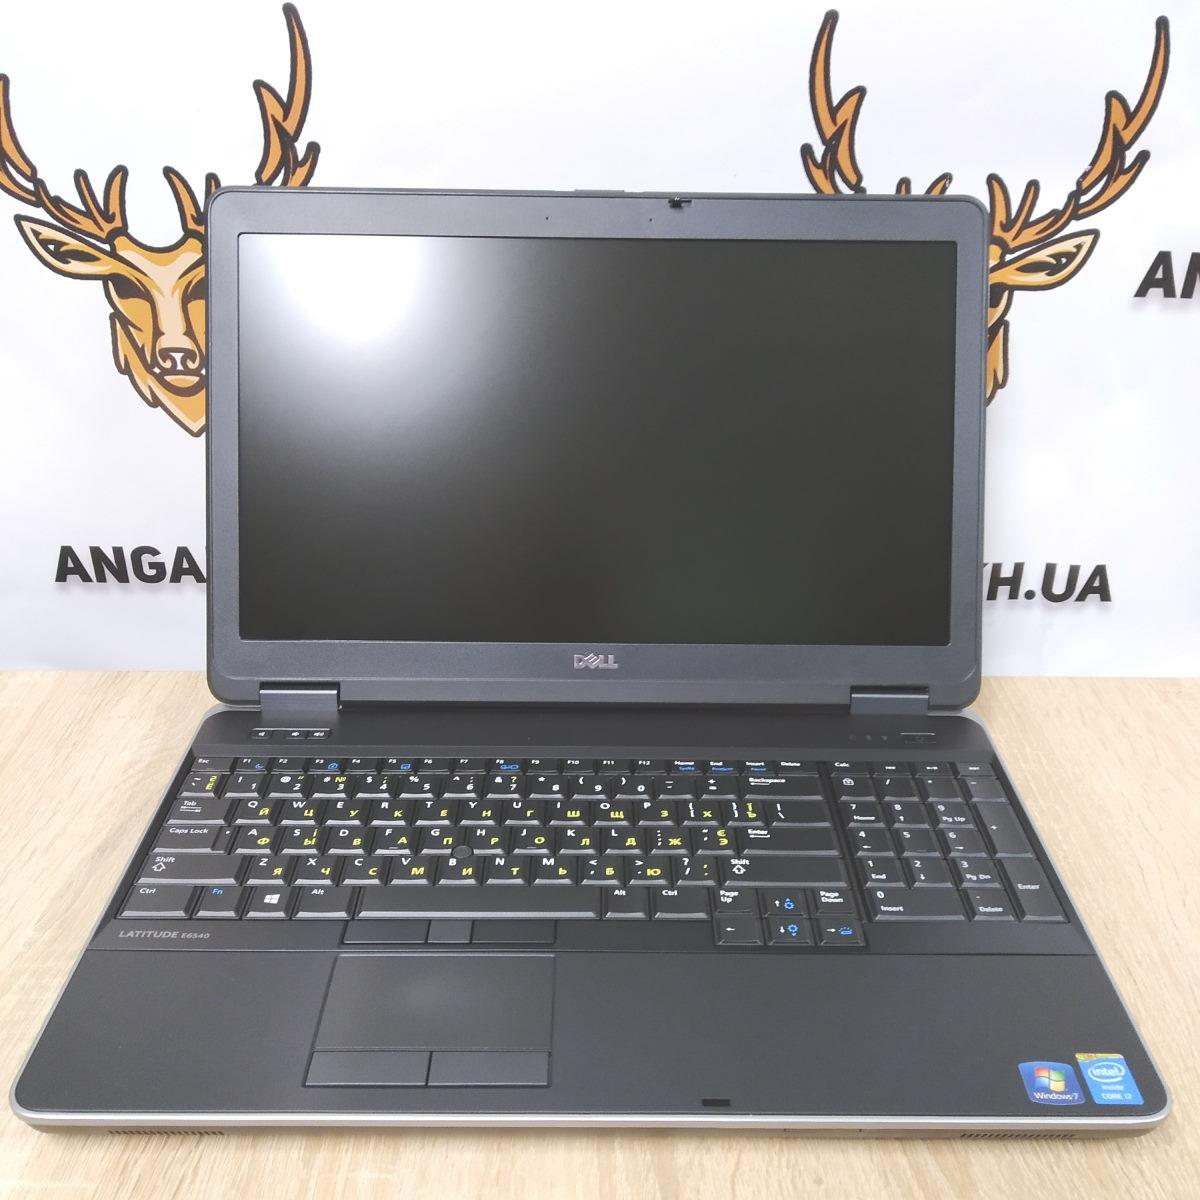 "Ноутбук б/у 15.6"" Dell Latitude E6540 (Intel Core i7-4800MQ / DDR3-8Gb / SSD 120Gb / IPS / RadeonHD / АКБ 1.5)"